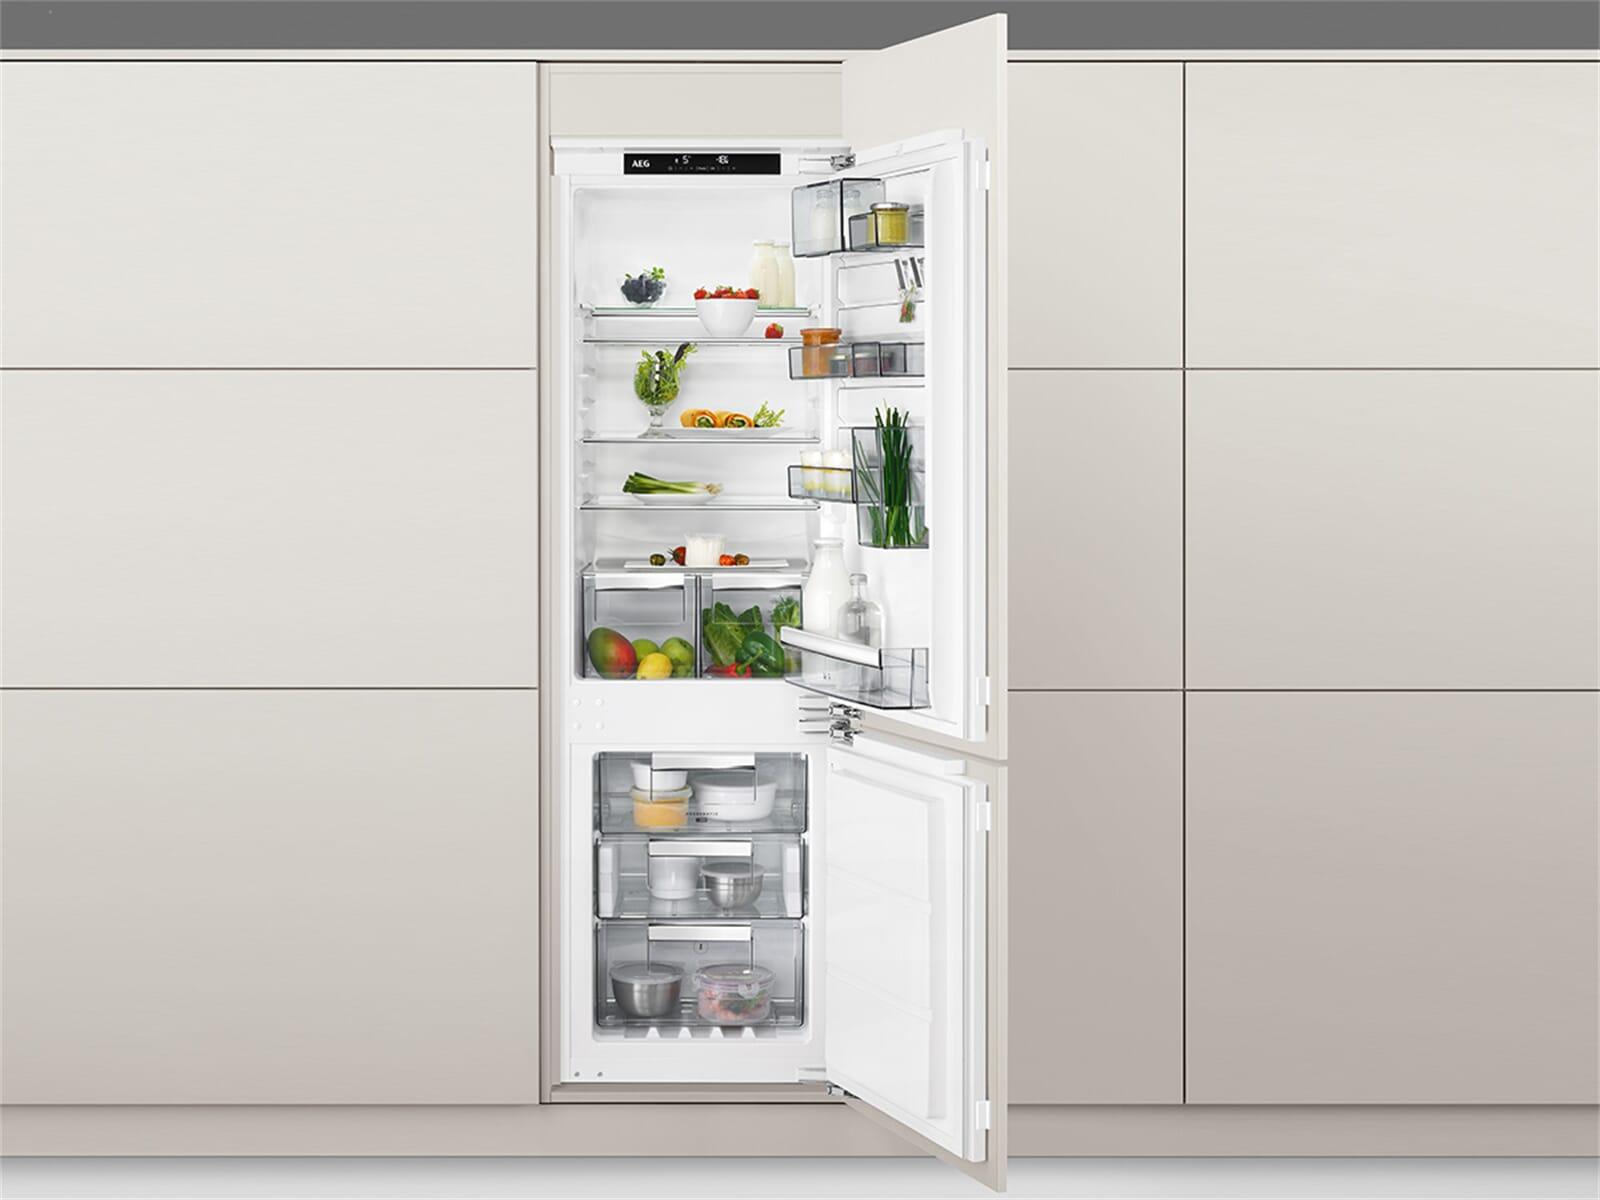 Aeg Kühlschrank Festtür Montage : Aeg sce81824nc einbau kühl gefrierkombination